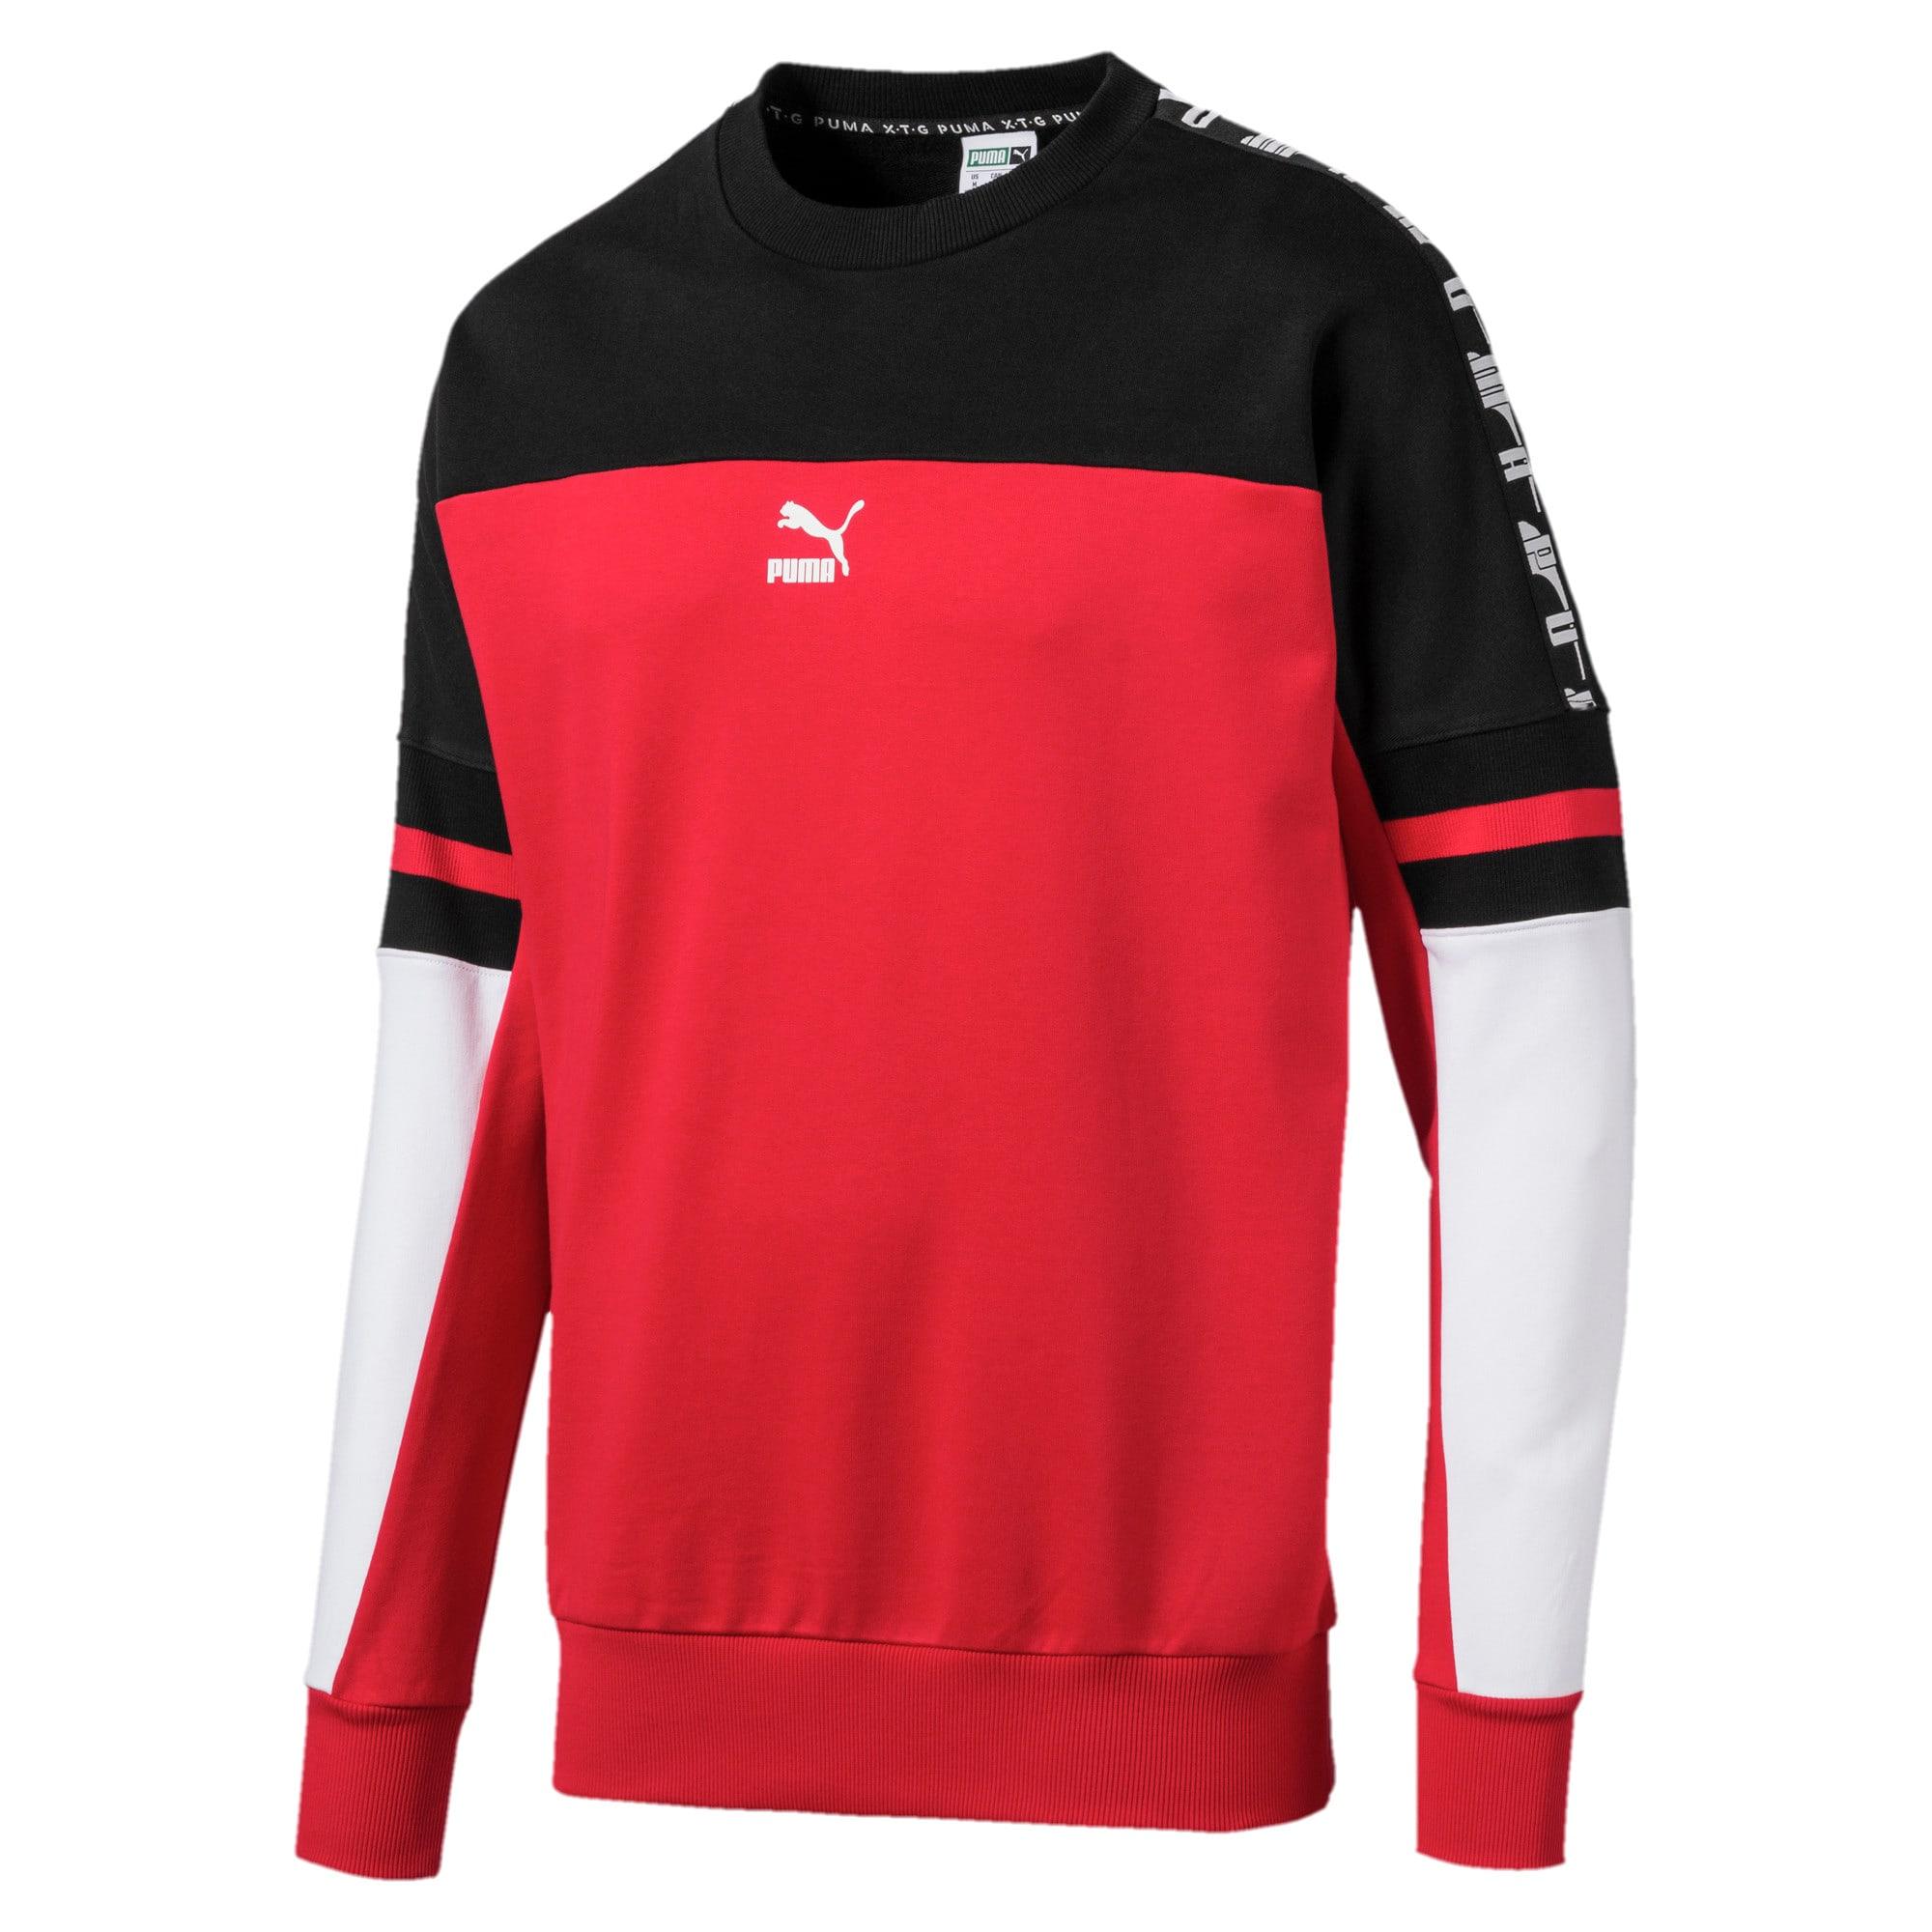 Thumbnail 4 of PUMA XTG Men's Crewneck Sweatshirt, High Risk Red, medium